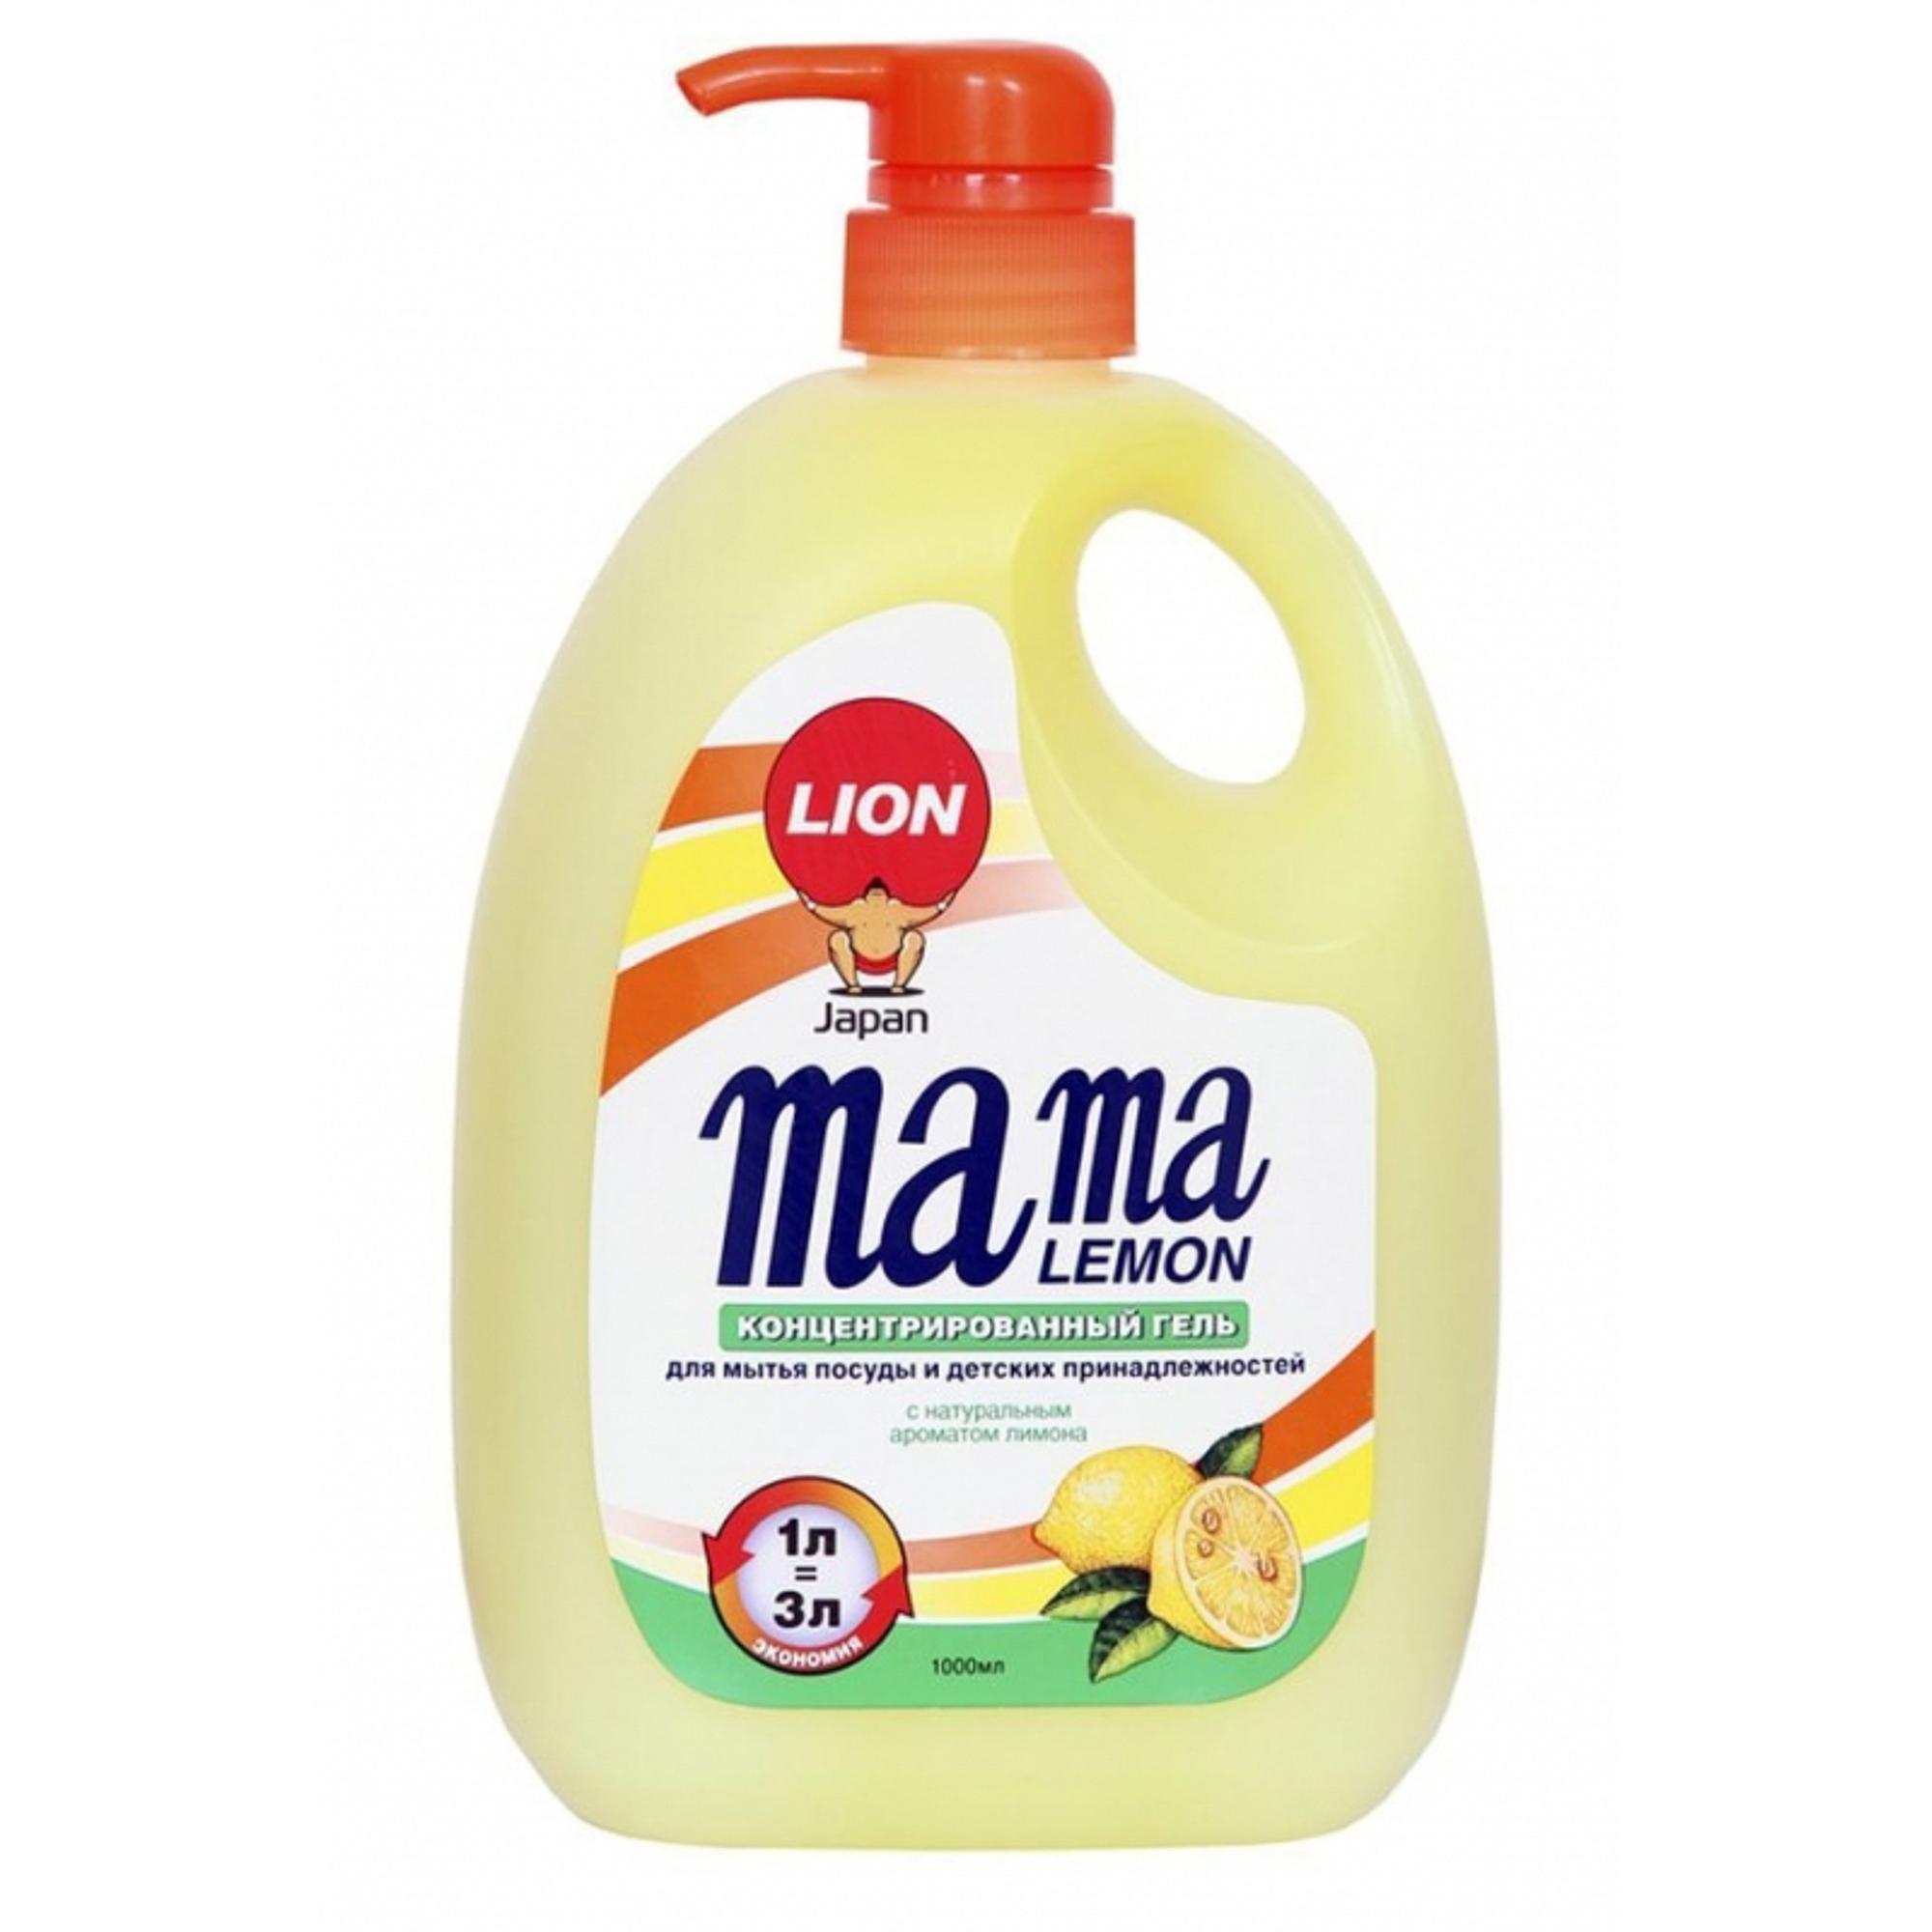 Средство Mama Lemon для мытья посуды Цитрус 1 л гель для мытья посуды mama lemon лимон natural lemon fragrance 600 мл